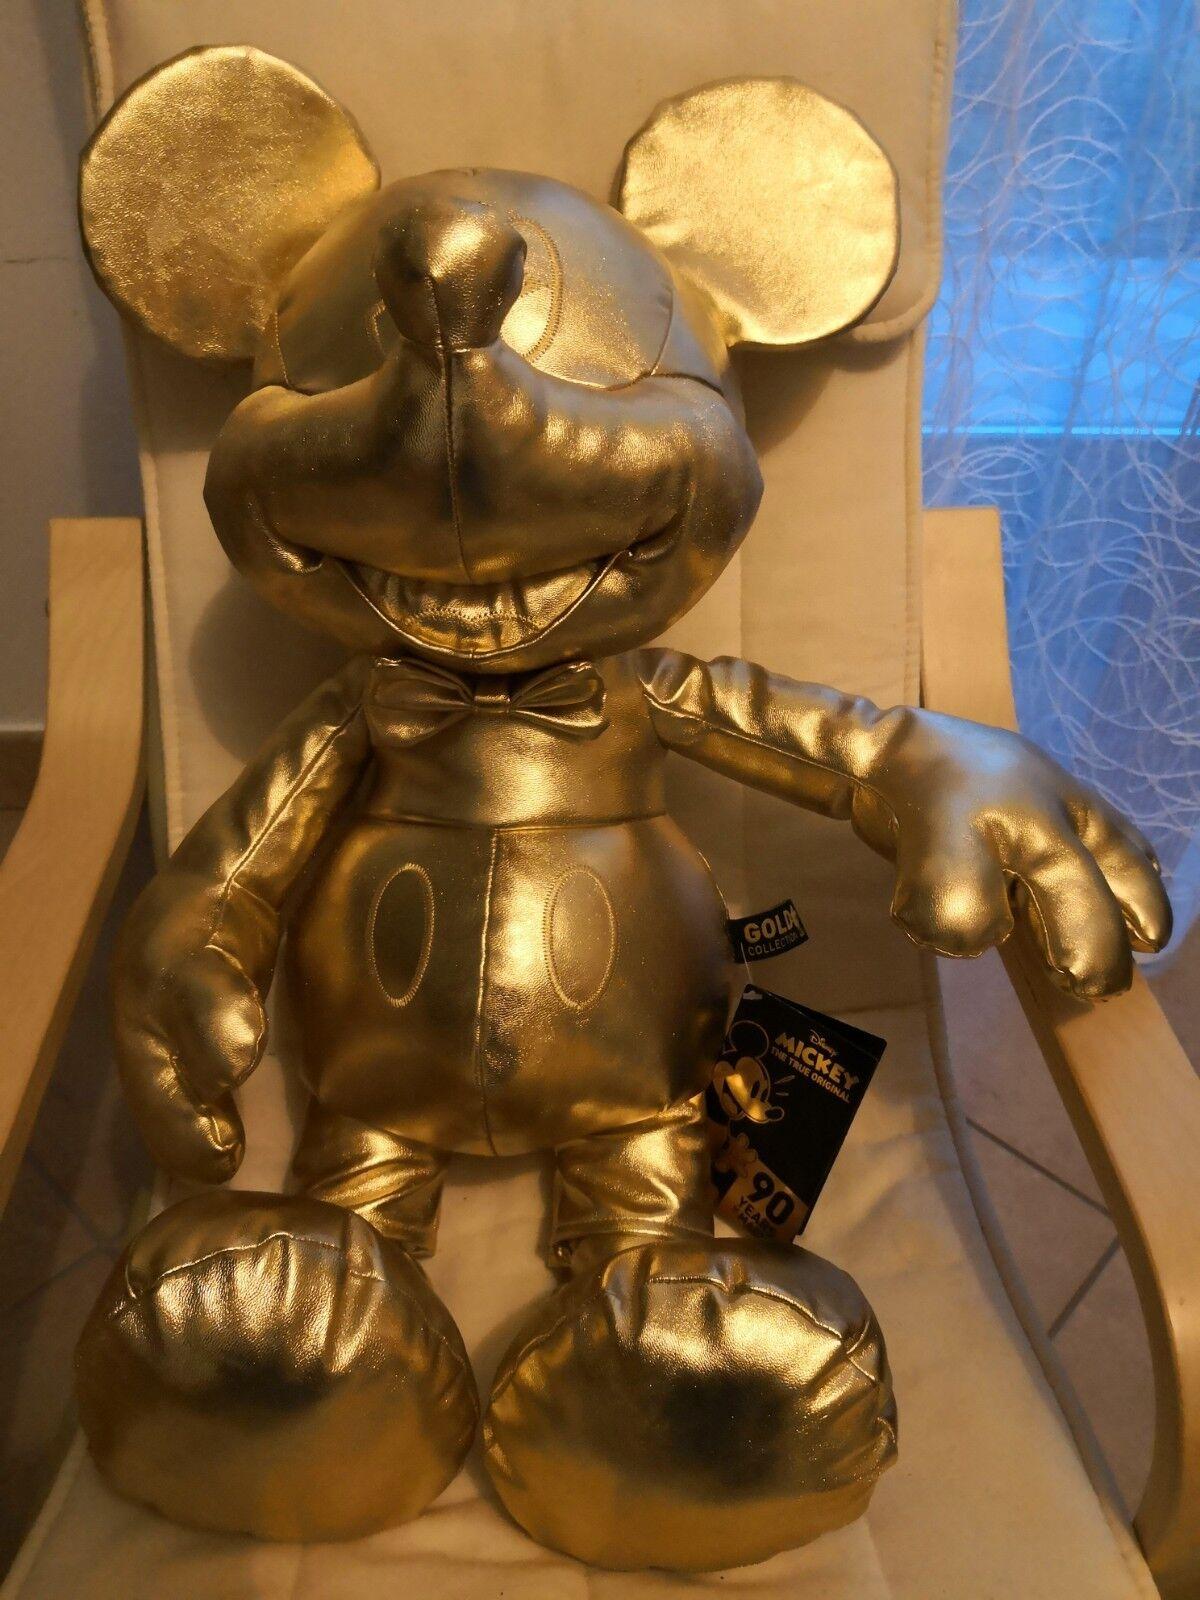 PELUCHE MICKEY MOUSE 90 gold BIG DA DA DA COLLEZIONE 7d7